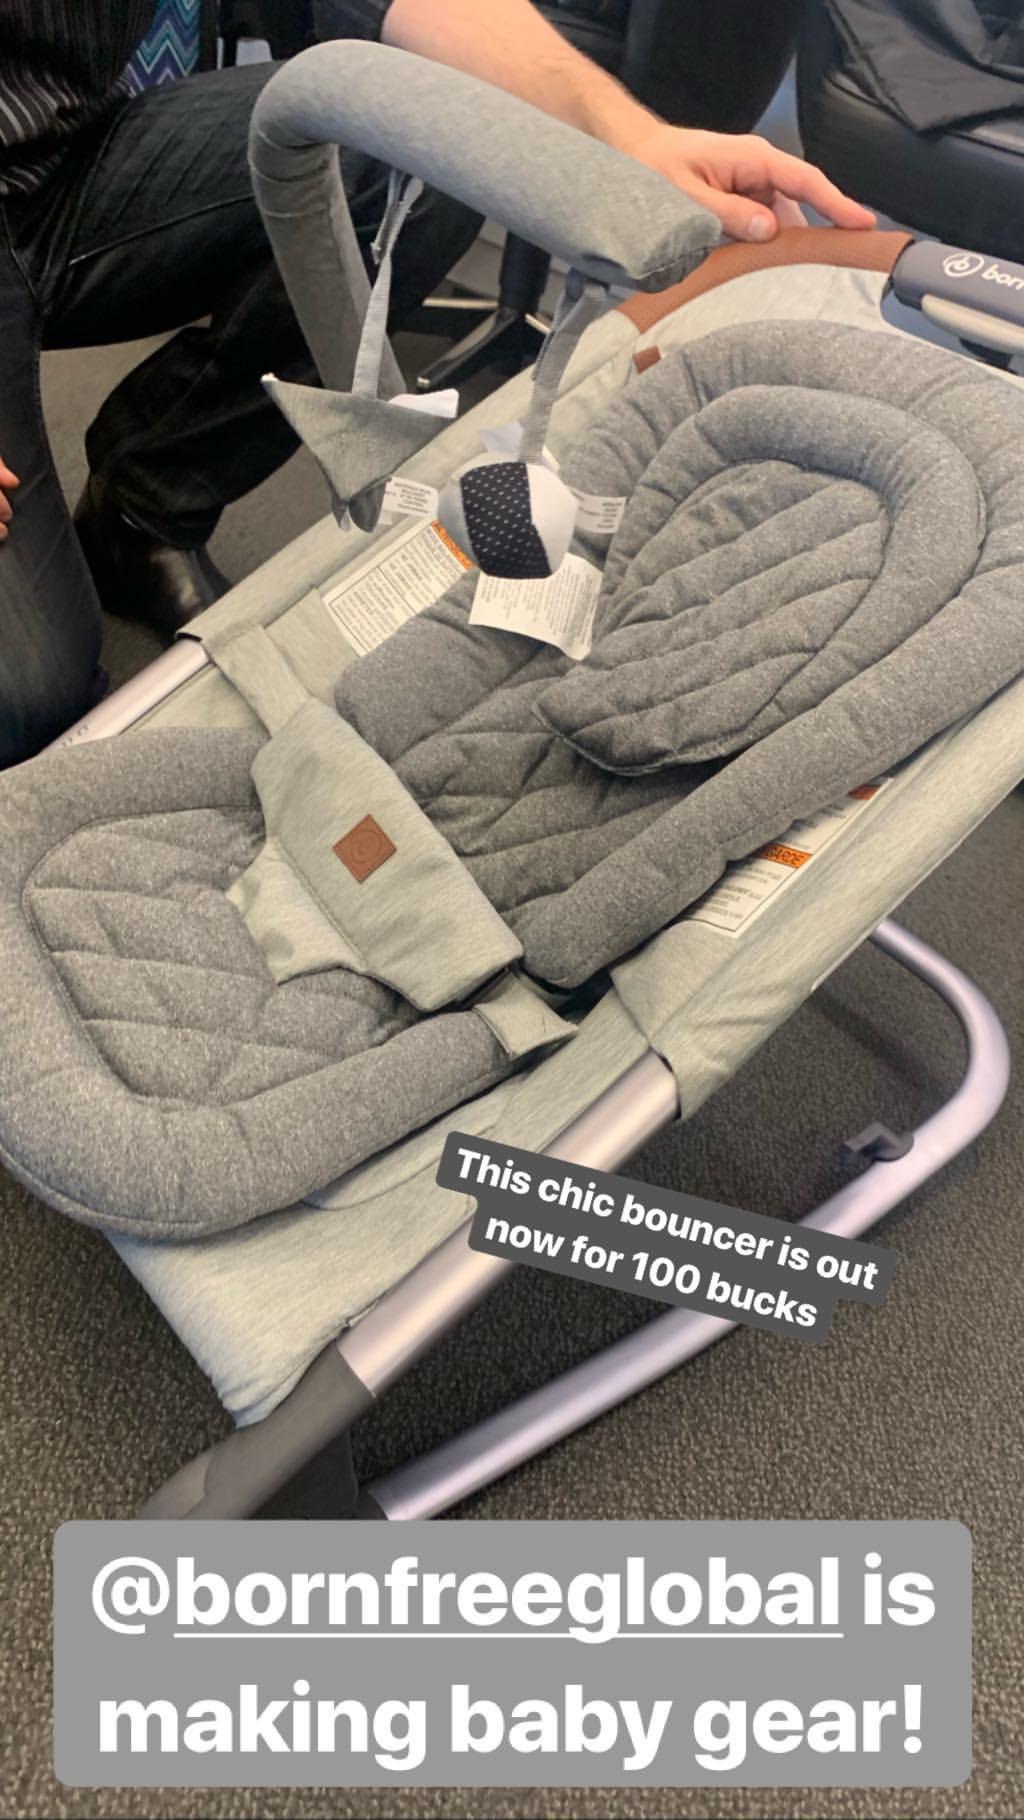 2019.03.22_(Parents) parentseditors, Instagram Story_born free kova baby bouncer.jpg